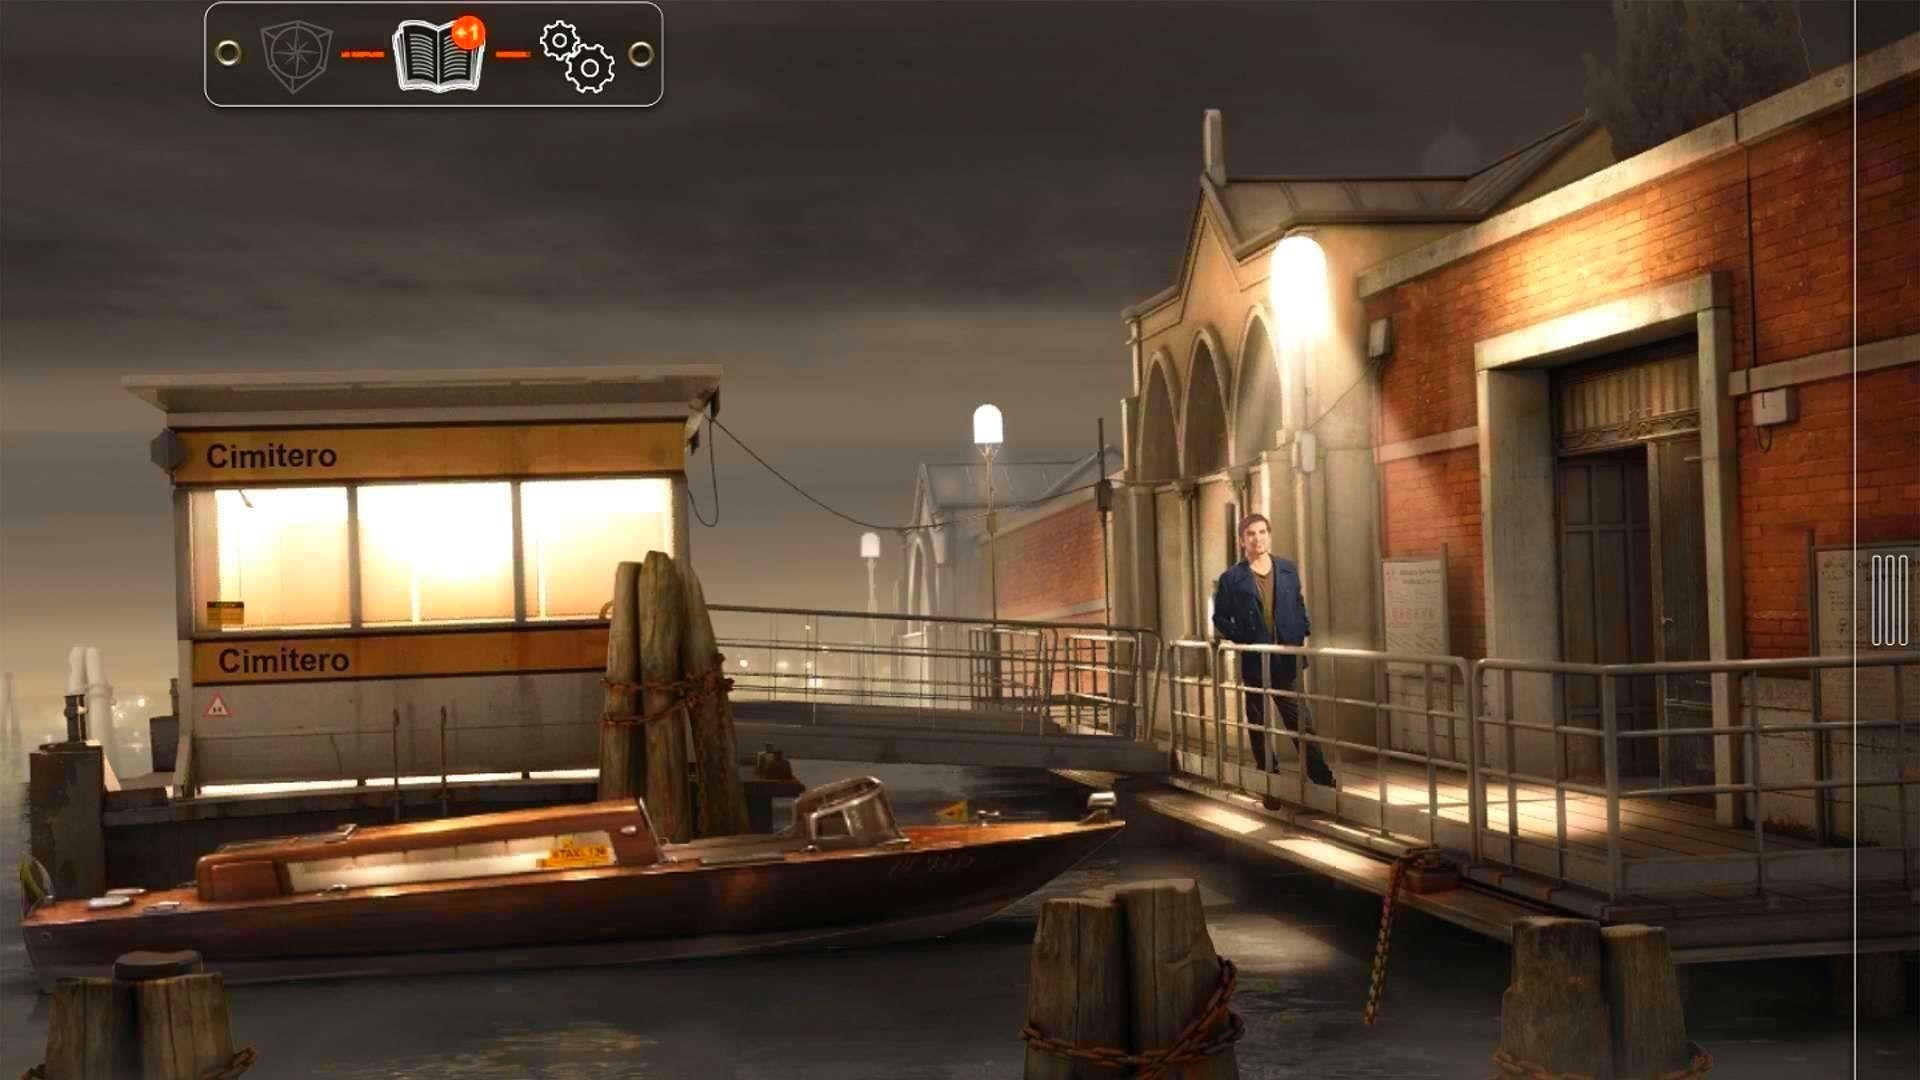 CortoMalteseScreenshot2.jpg